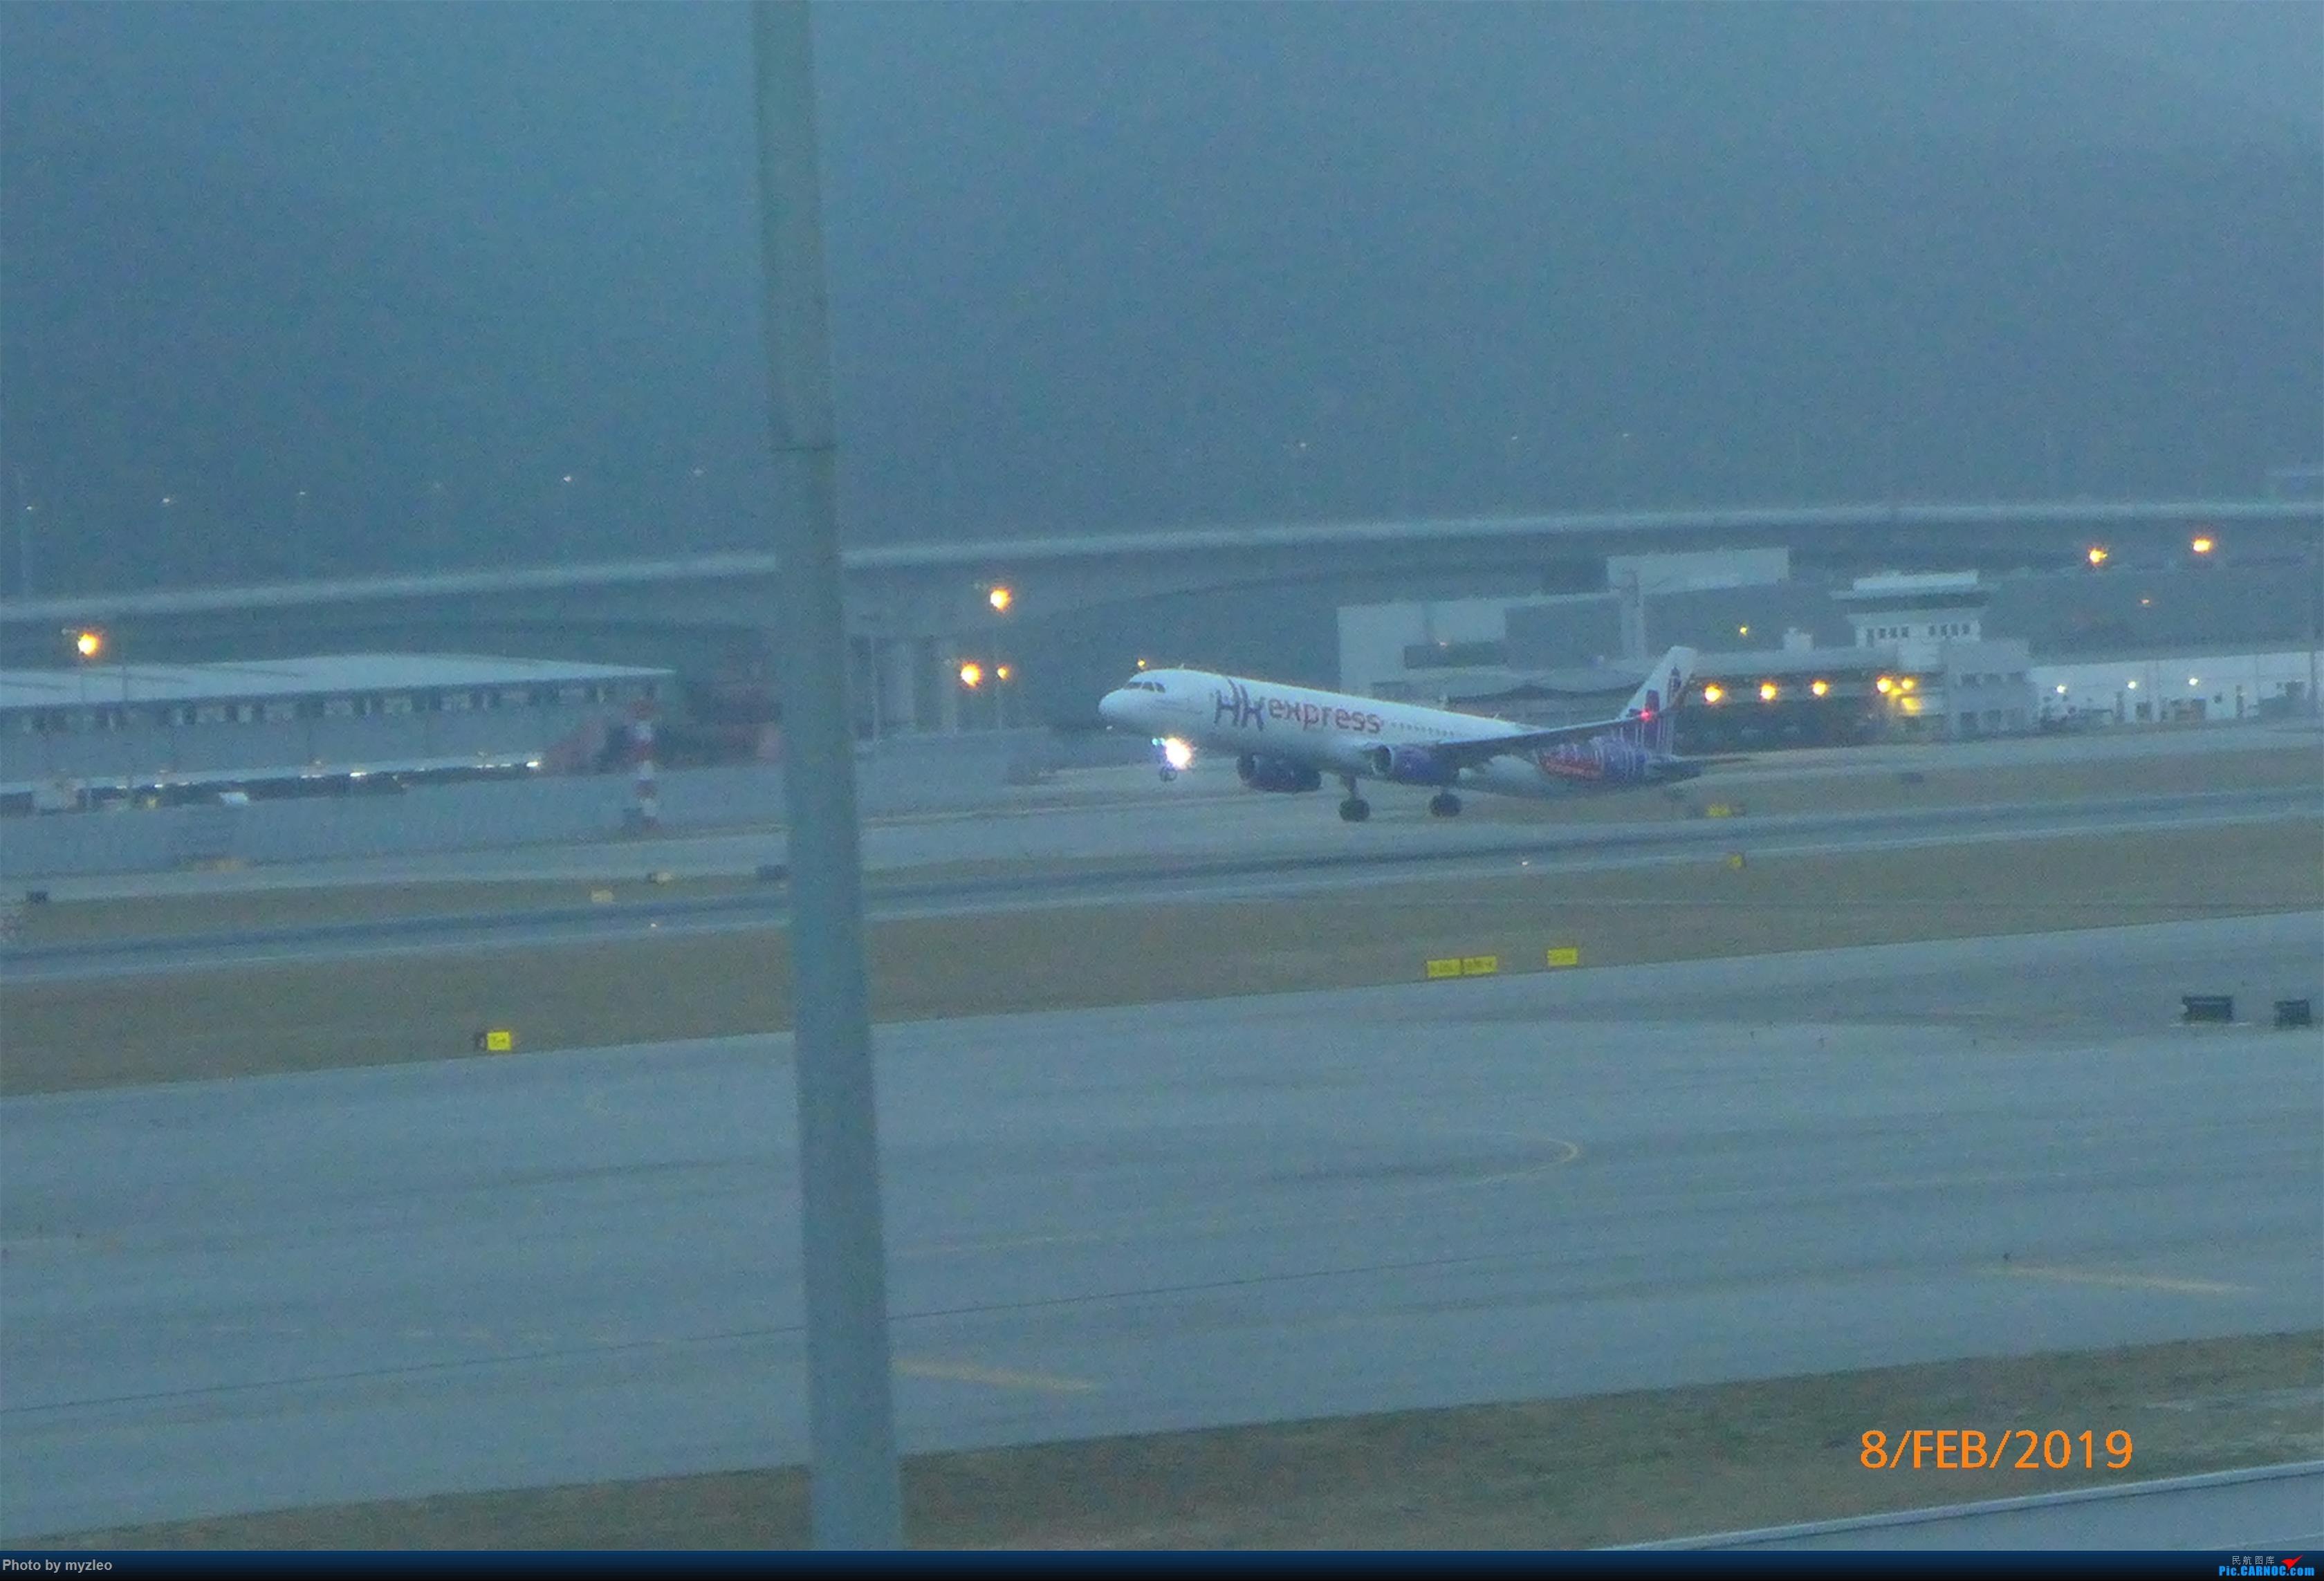 Re:[原创]【myzleo的游记4.5】十年之约(5)在香港的最后一天,搭乘港航333回沪 AIRBUS A321-200 B-LED 中国香港国际机场